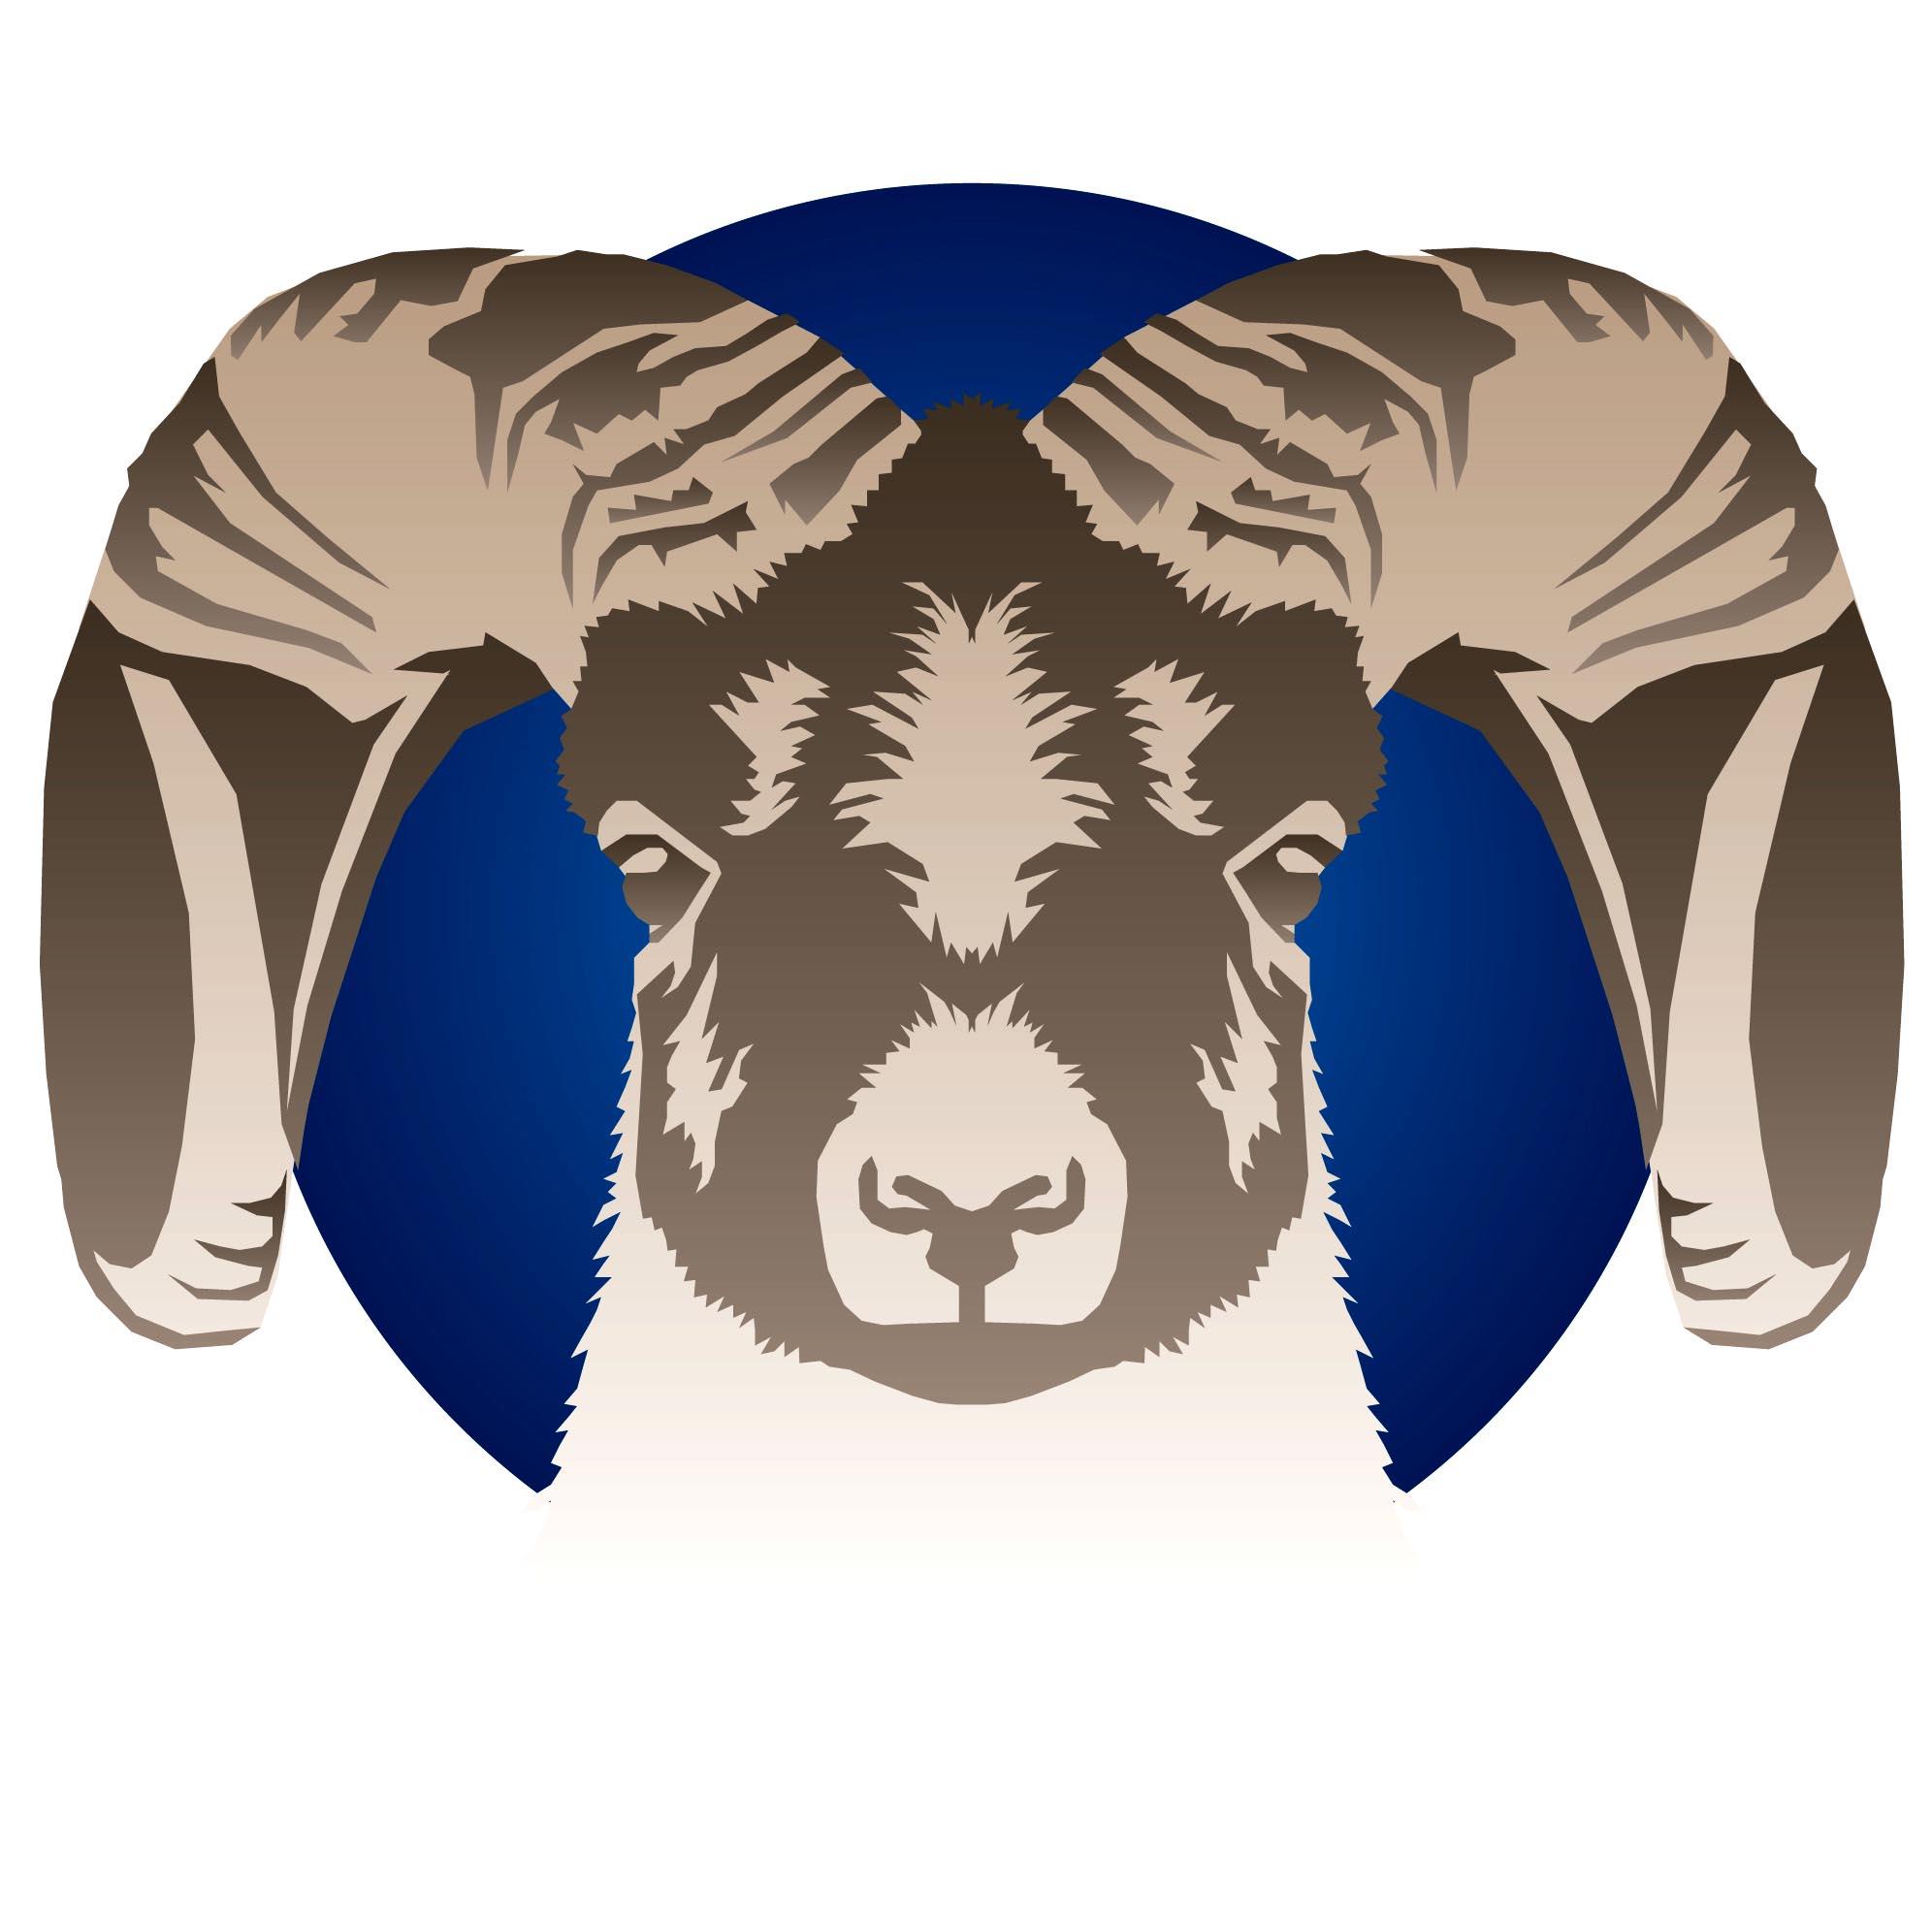 Aries 2021 Yearly Horoscope Forecast